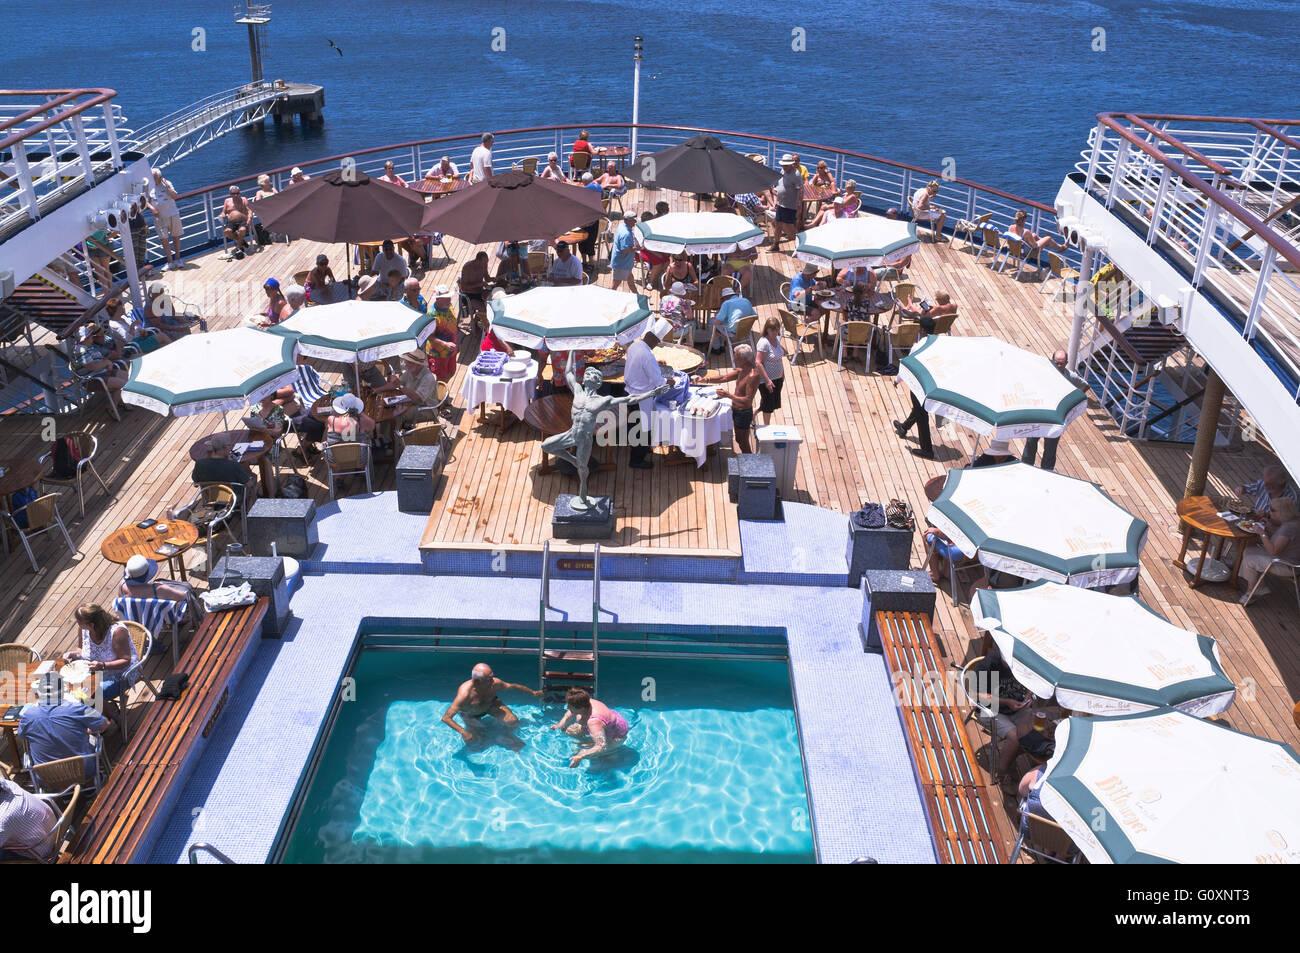 dh CMV Marco Polo cruise ship CRUISING TRAVEL Deck passengers swimming pool buffet on board Stock Photo